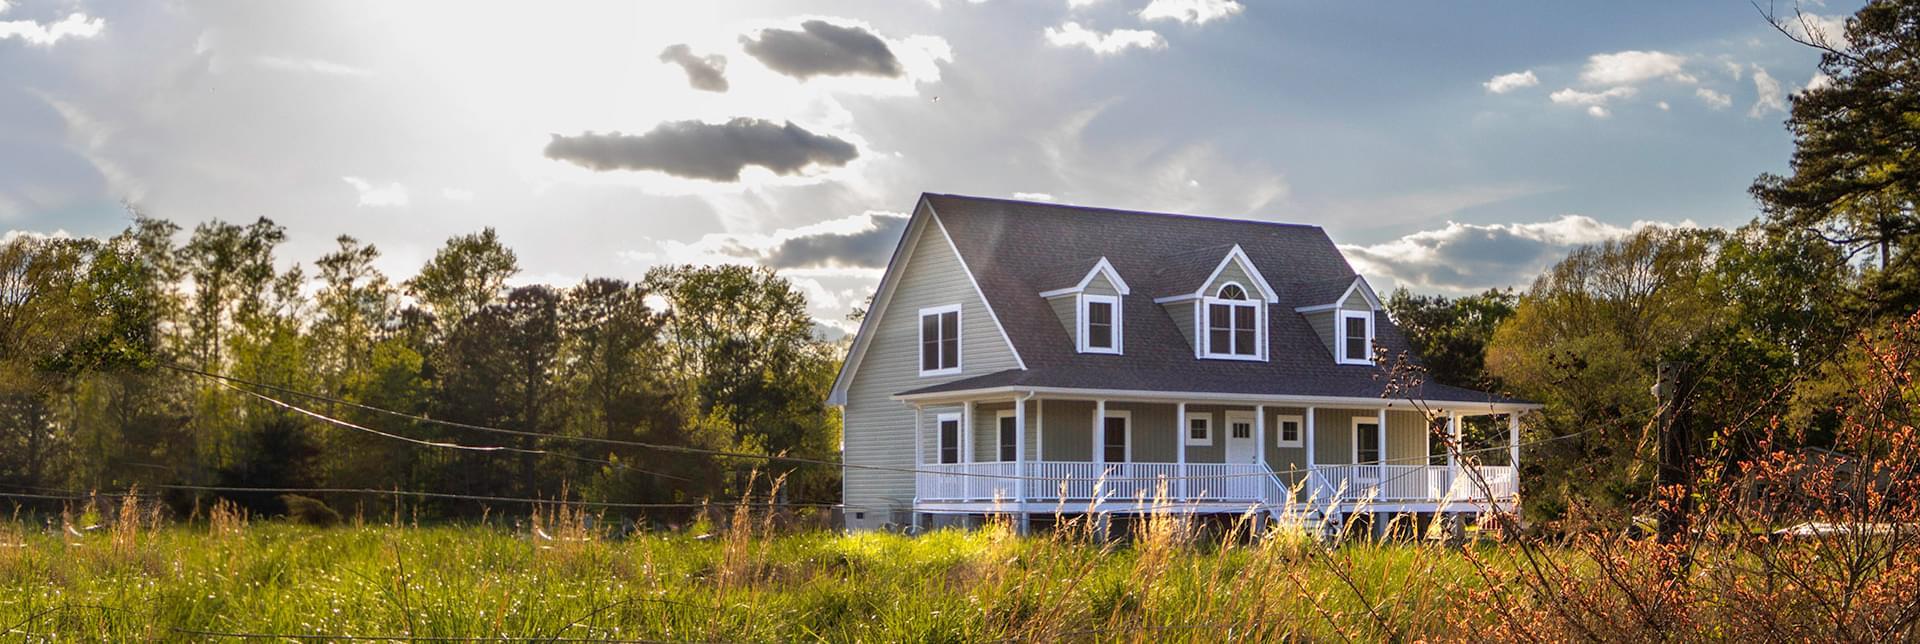 New Homes in Northampton County VA